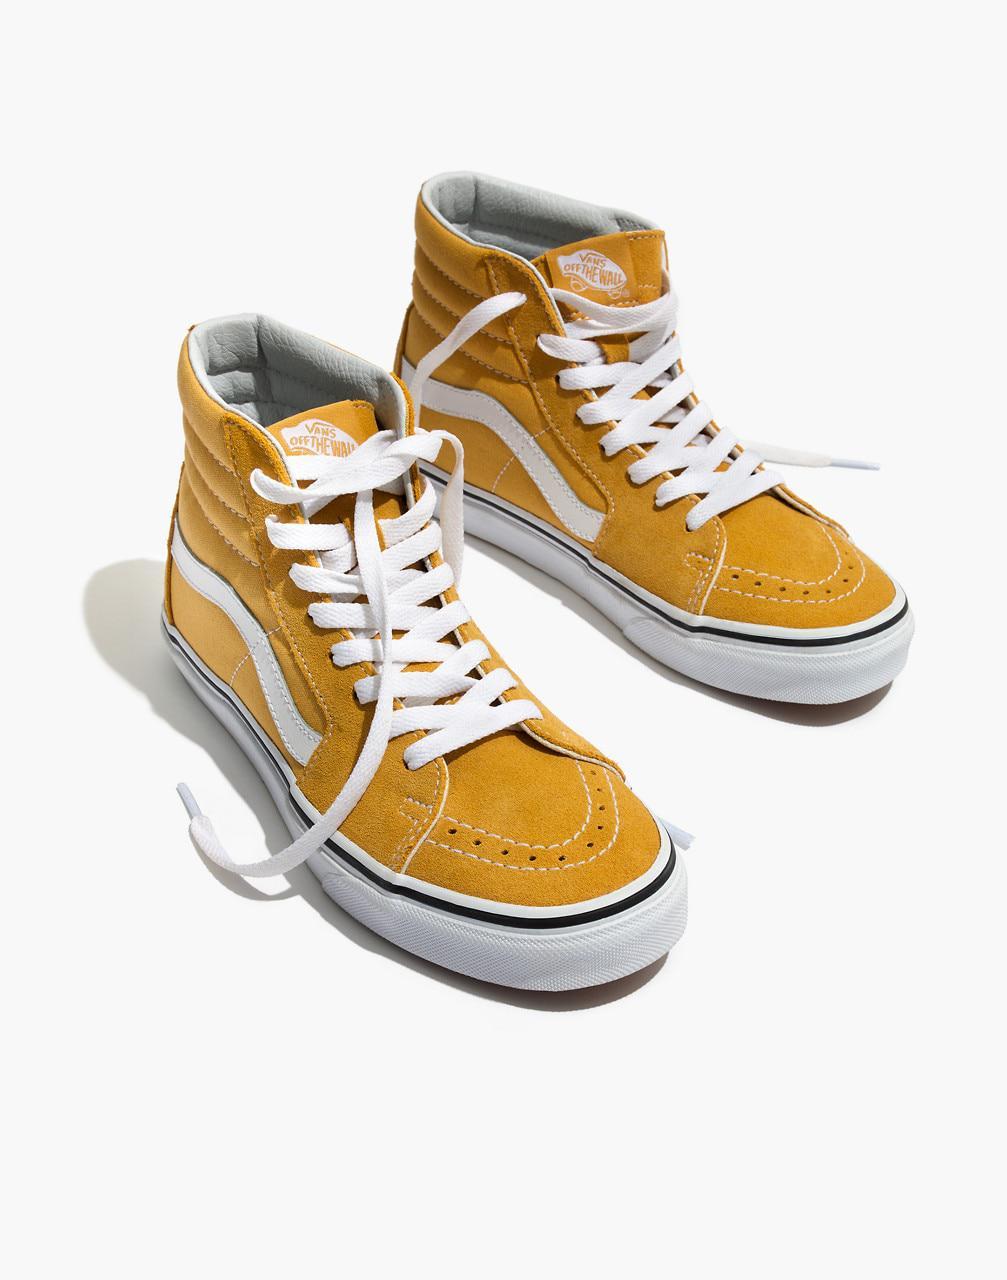 0611f23bfa Lyst - Madewell Vans Unisex Sk8-hi High-top Sneakers In Ochre Suede